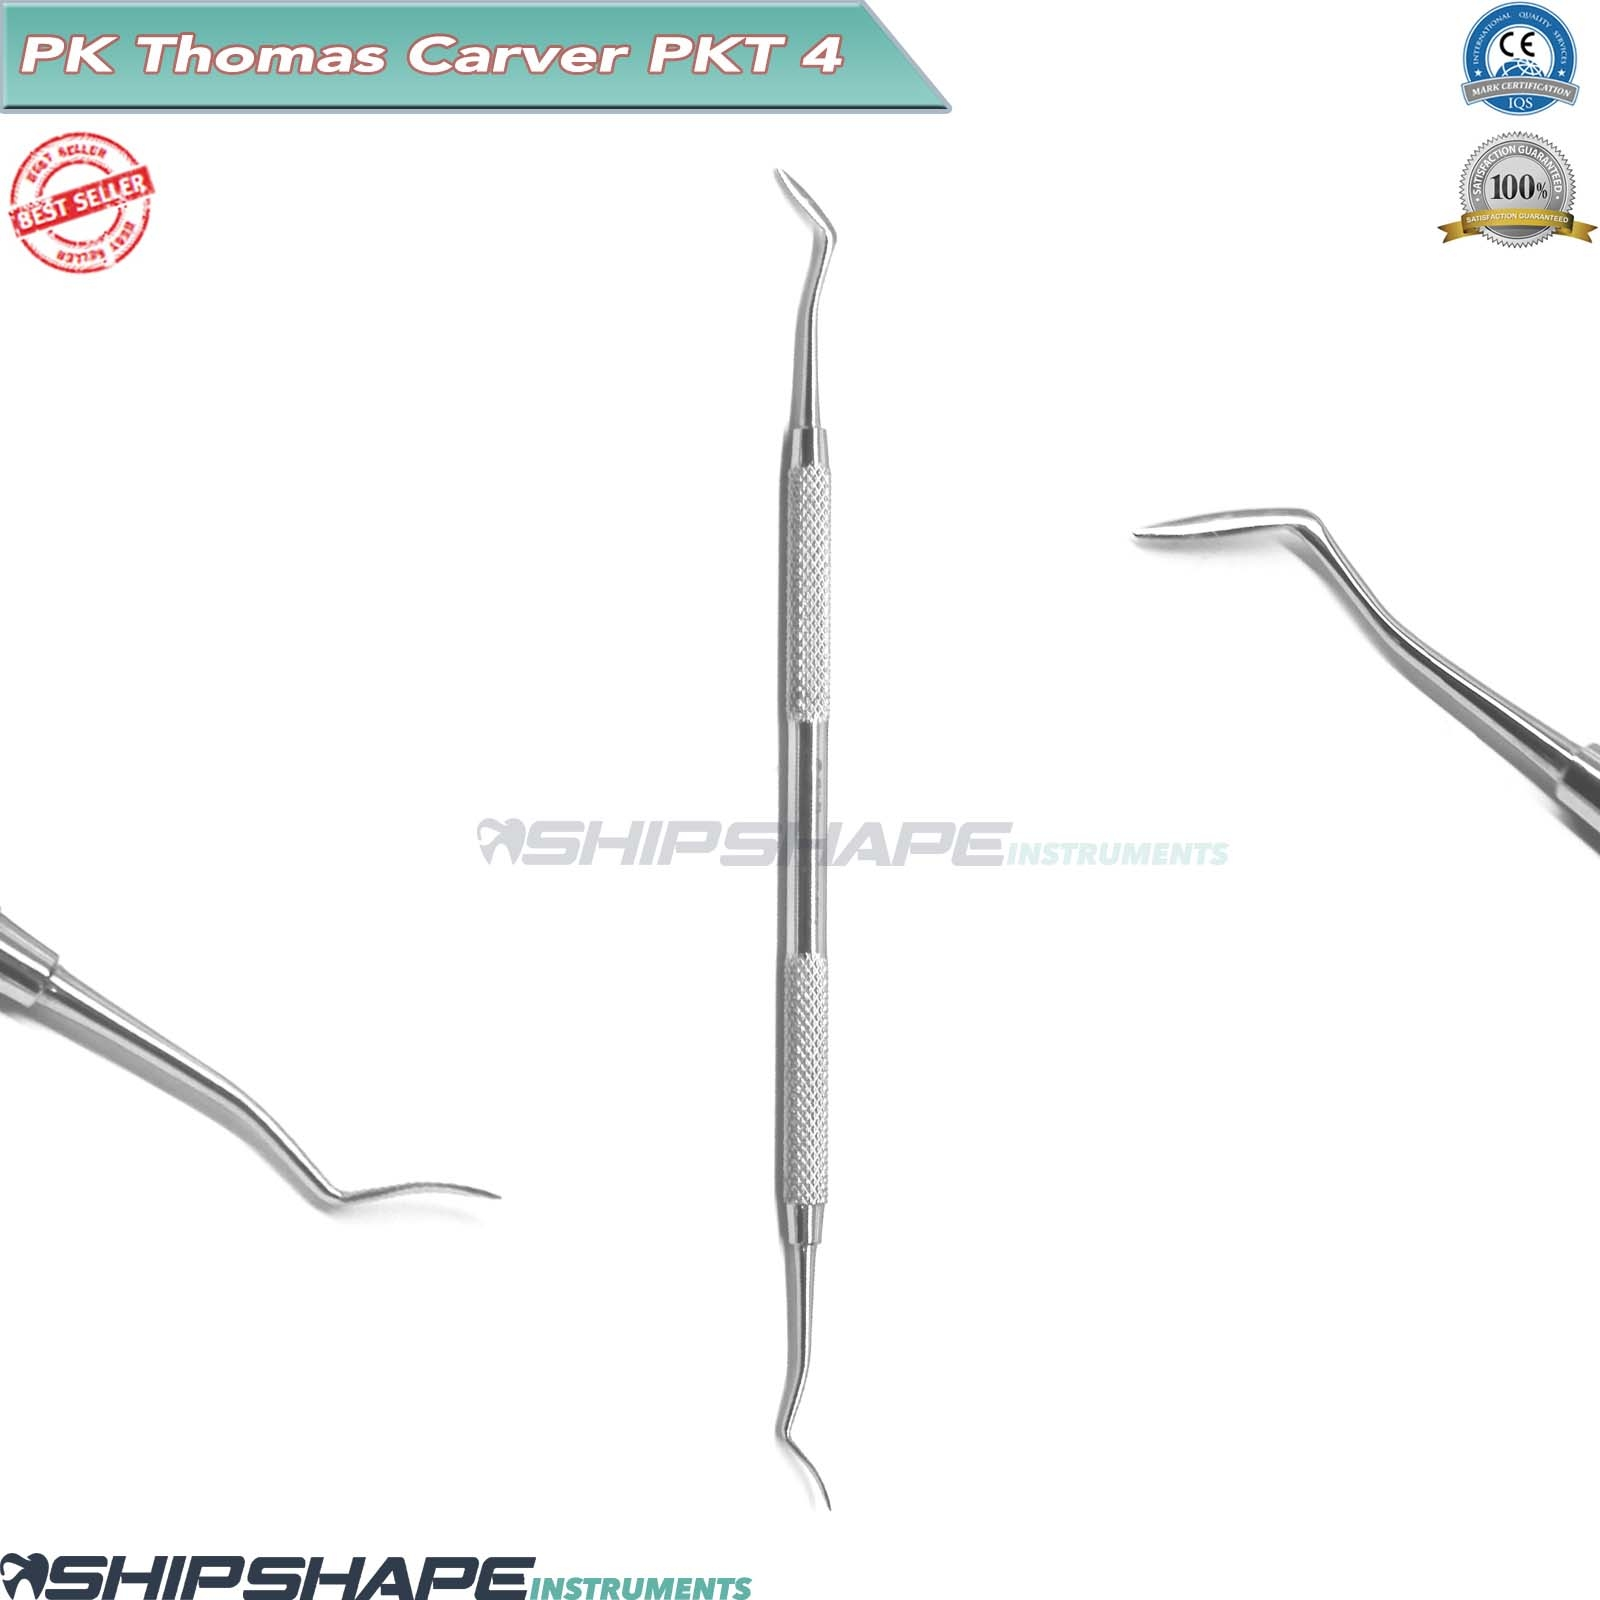 PK Thomas Restorative Dental Filling Instruments PKT4-004 | Shipshape Instruments-0